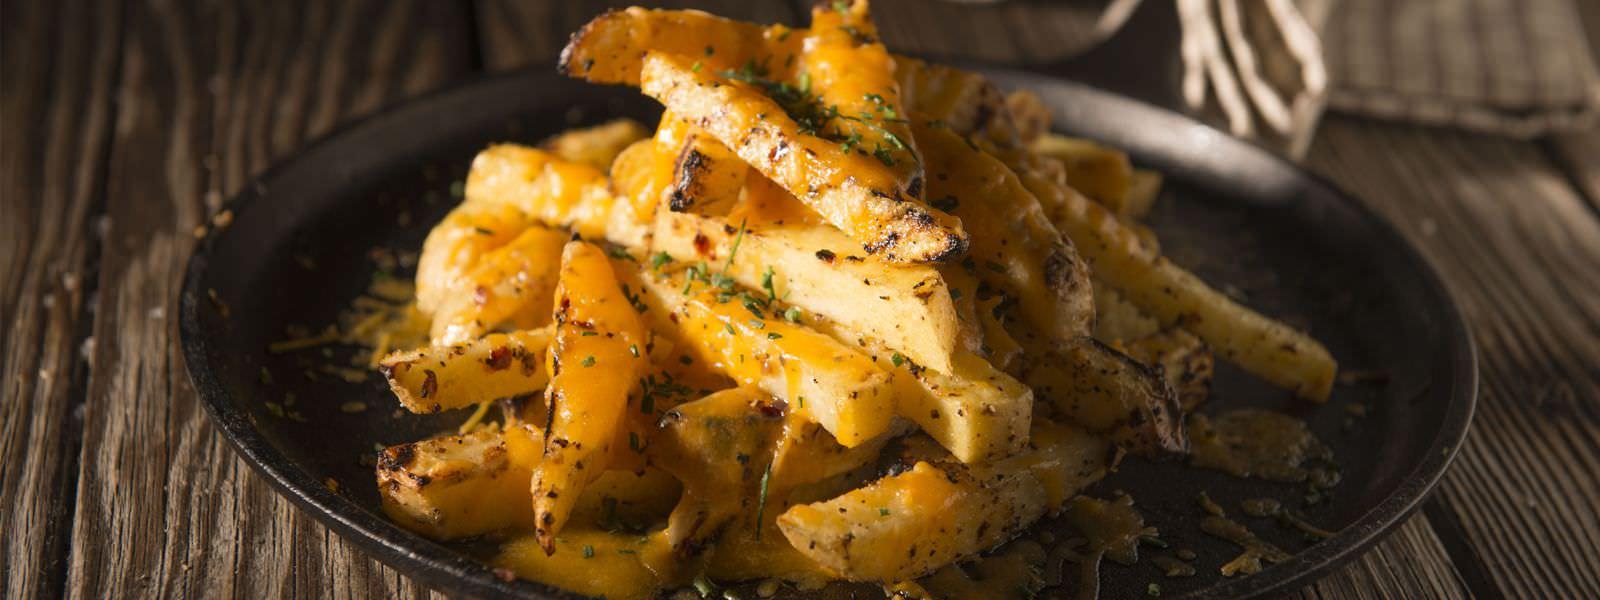 DW_Recipe_Cheesy_Garlic_Fries_Hero